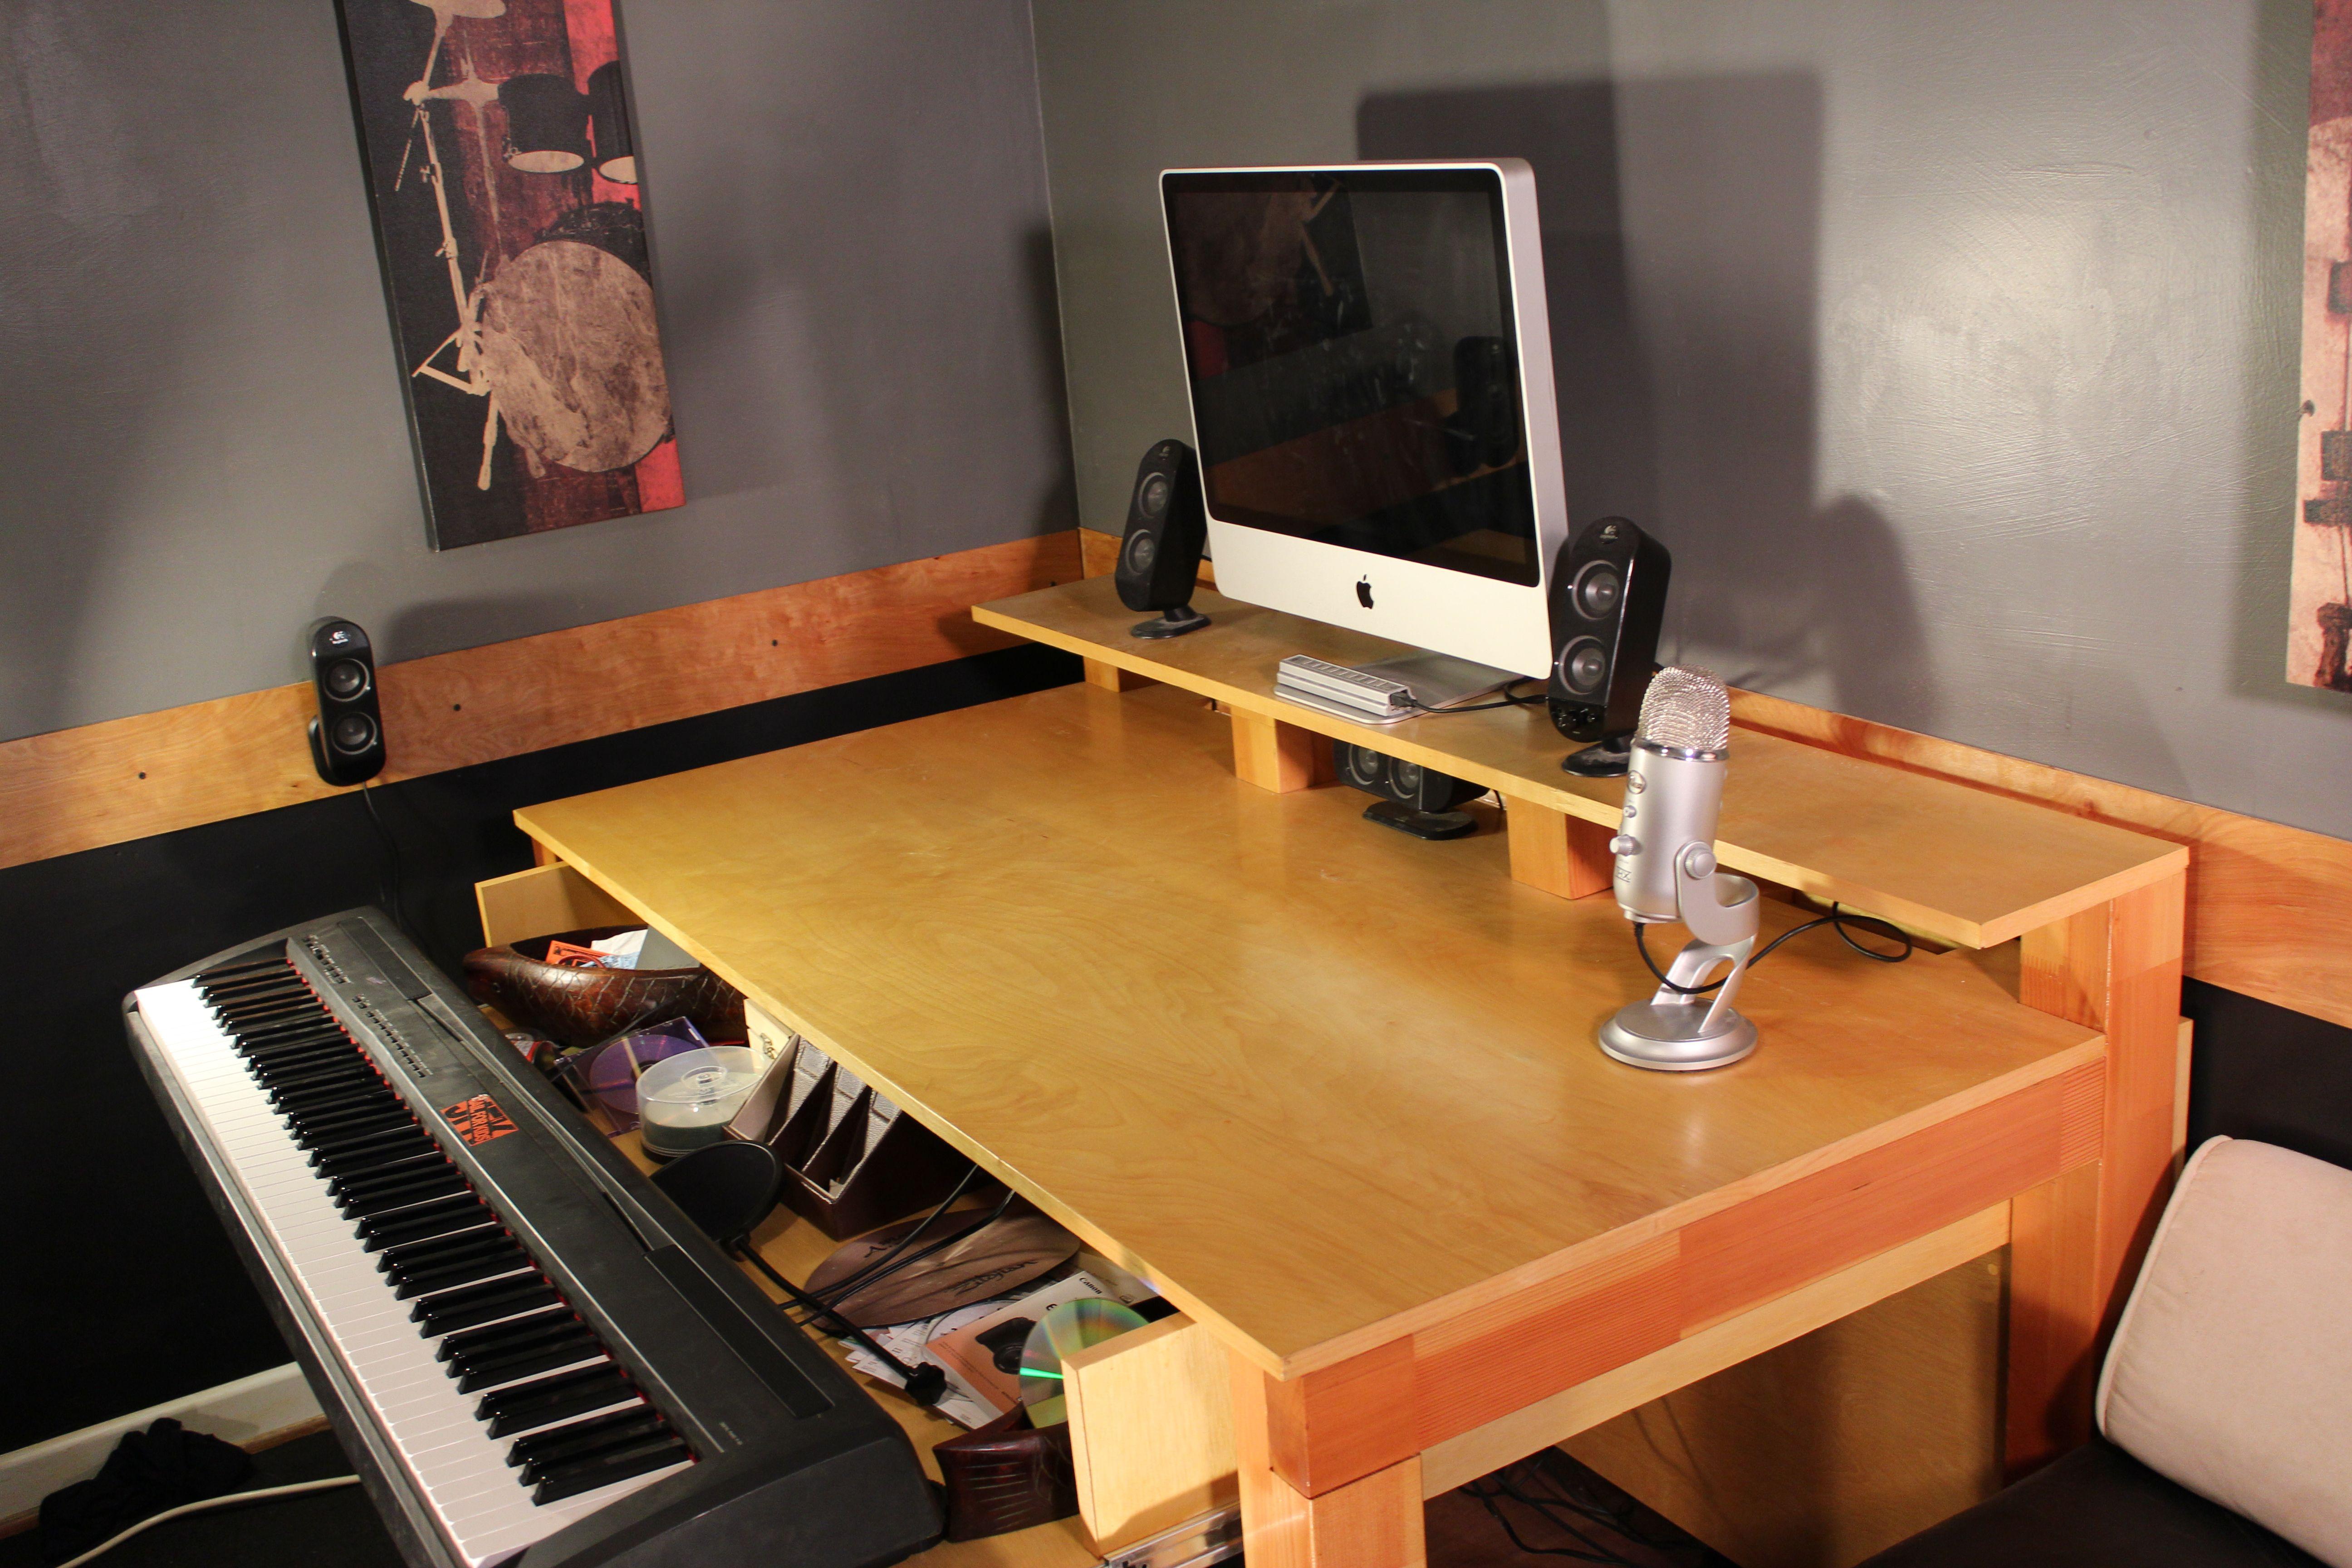 Music Studio Desk Post